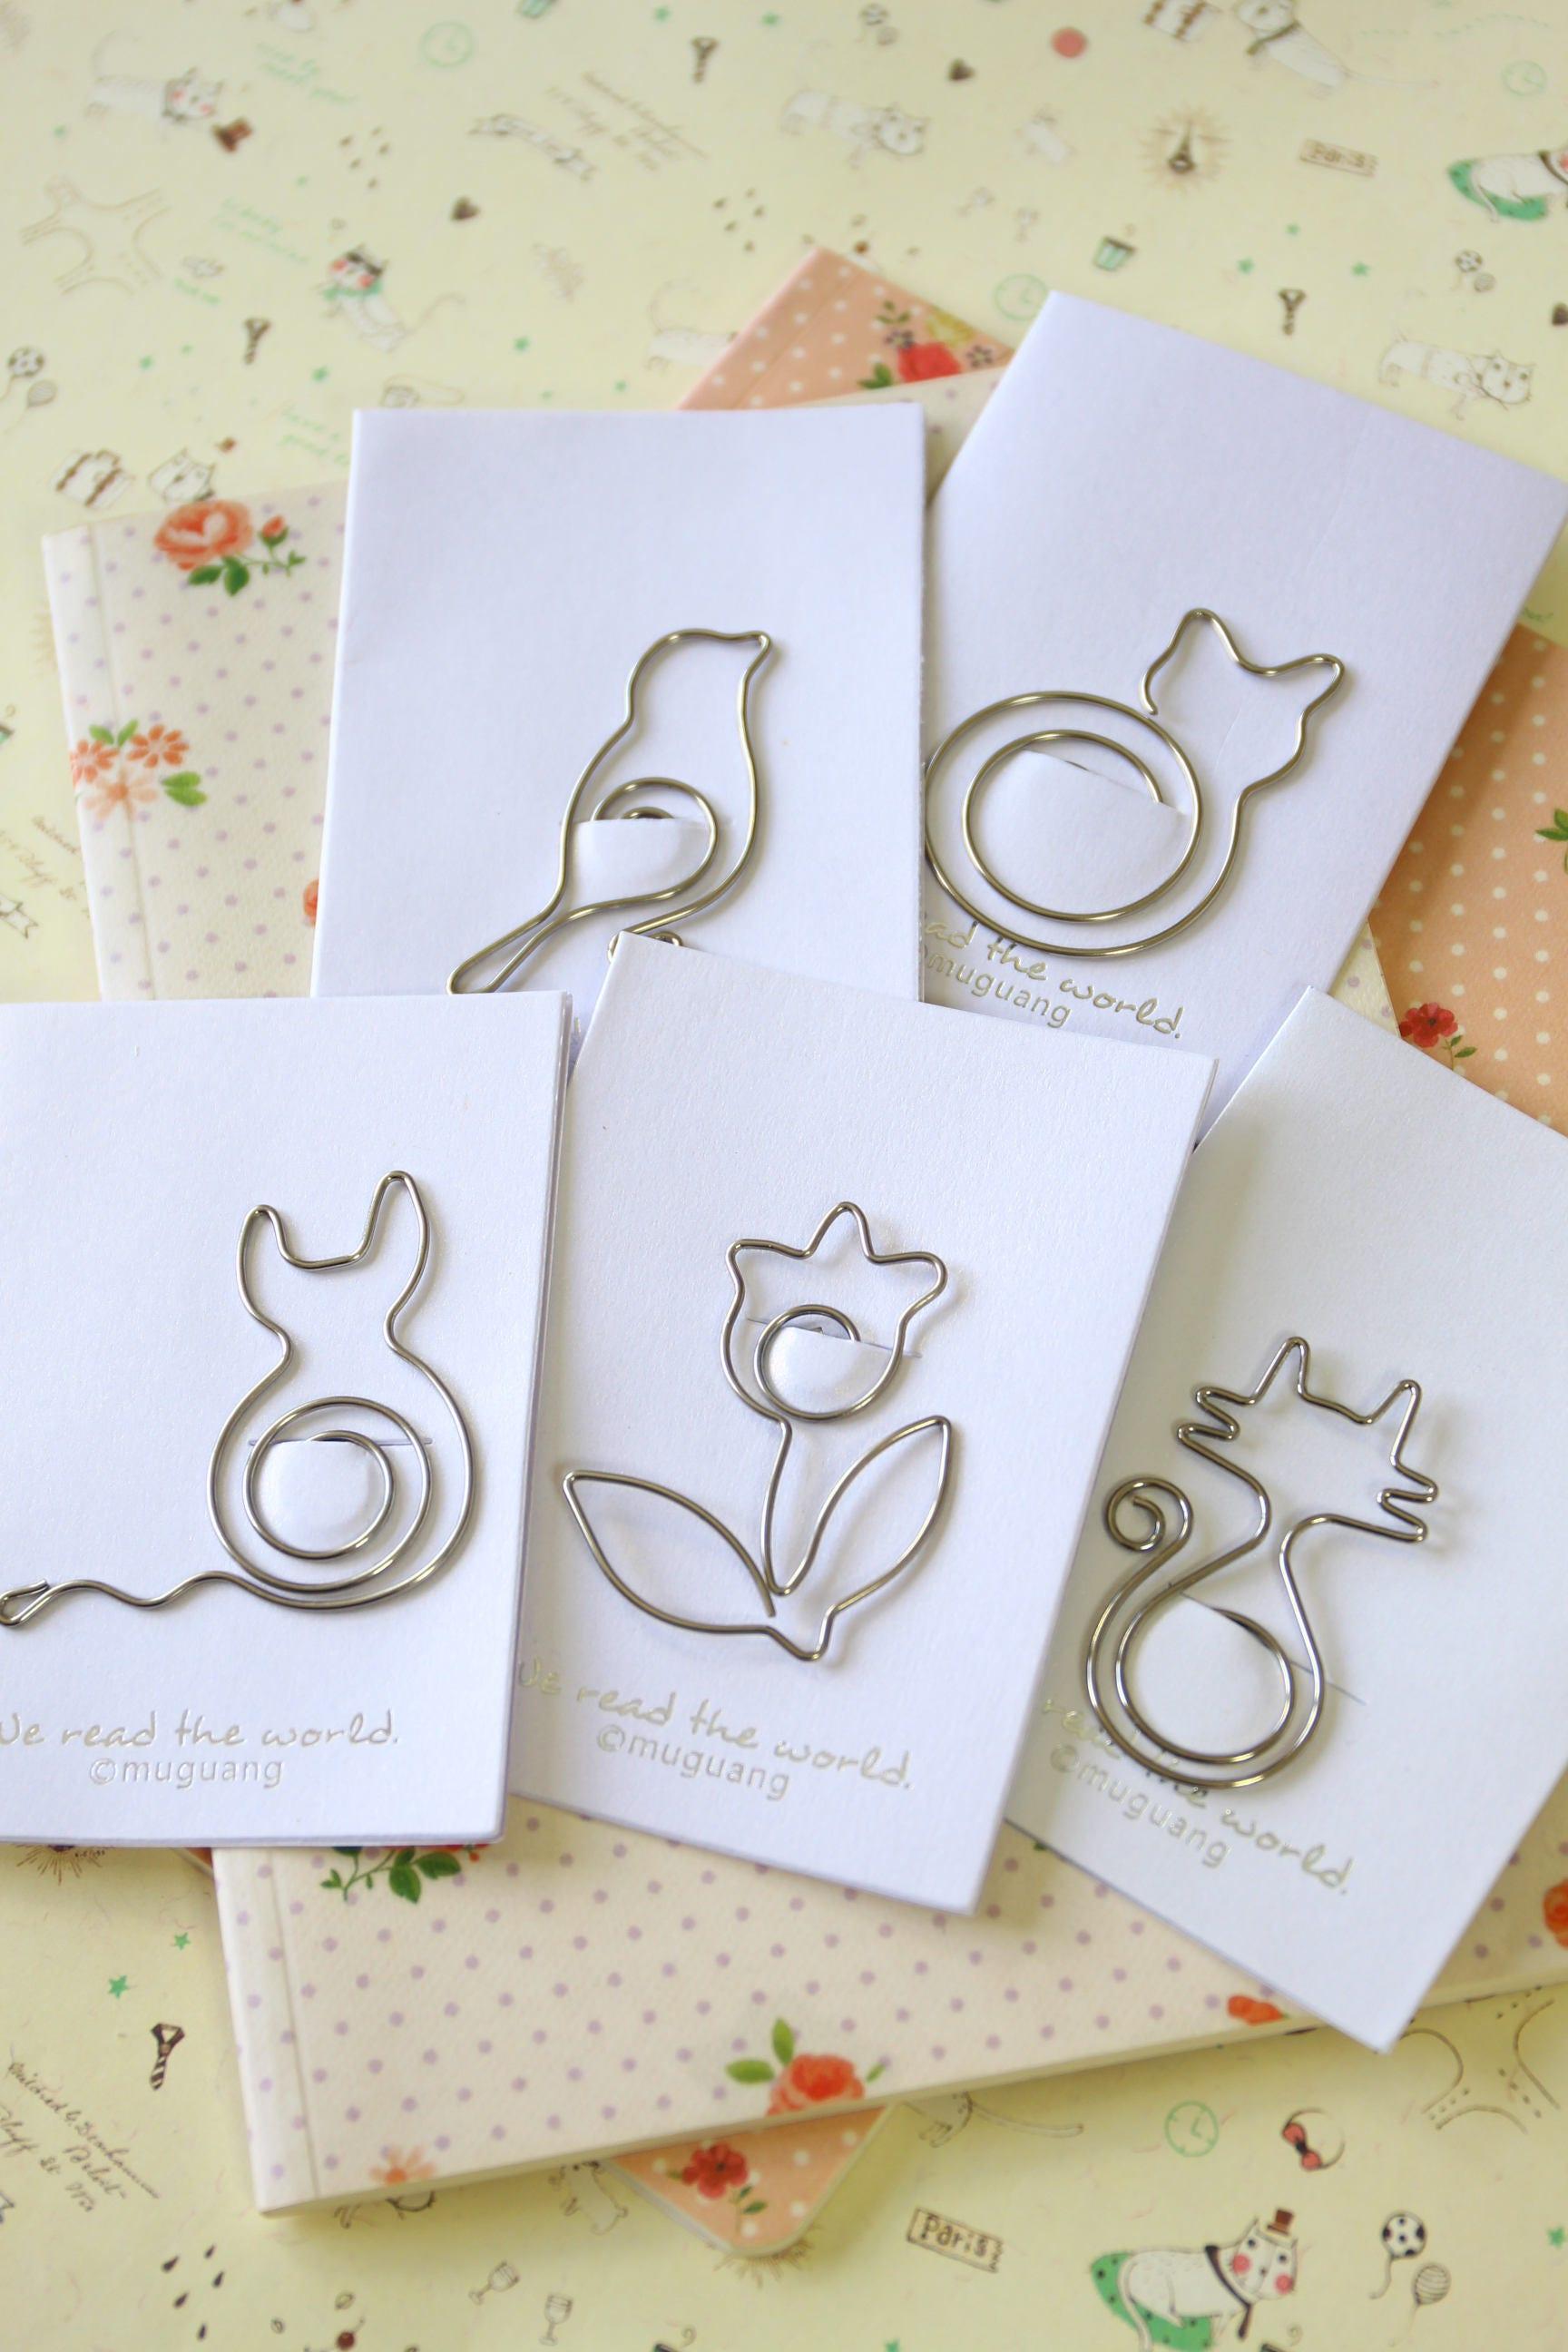 Bird Mini Shapes paper clips bookmarks [E10261624442122032M] - $3.00 ...